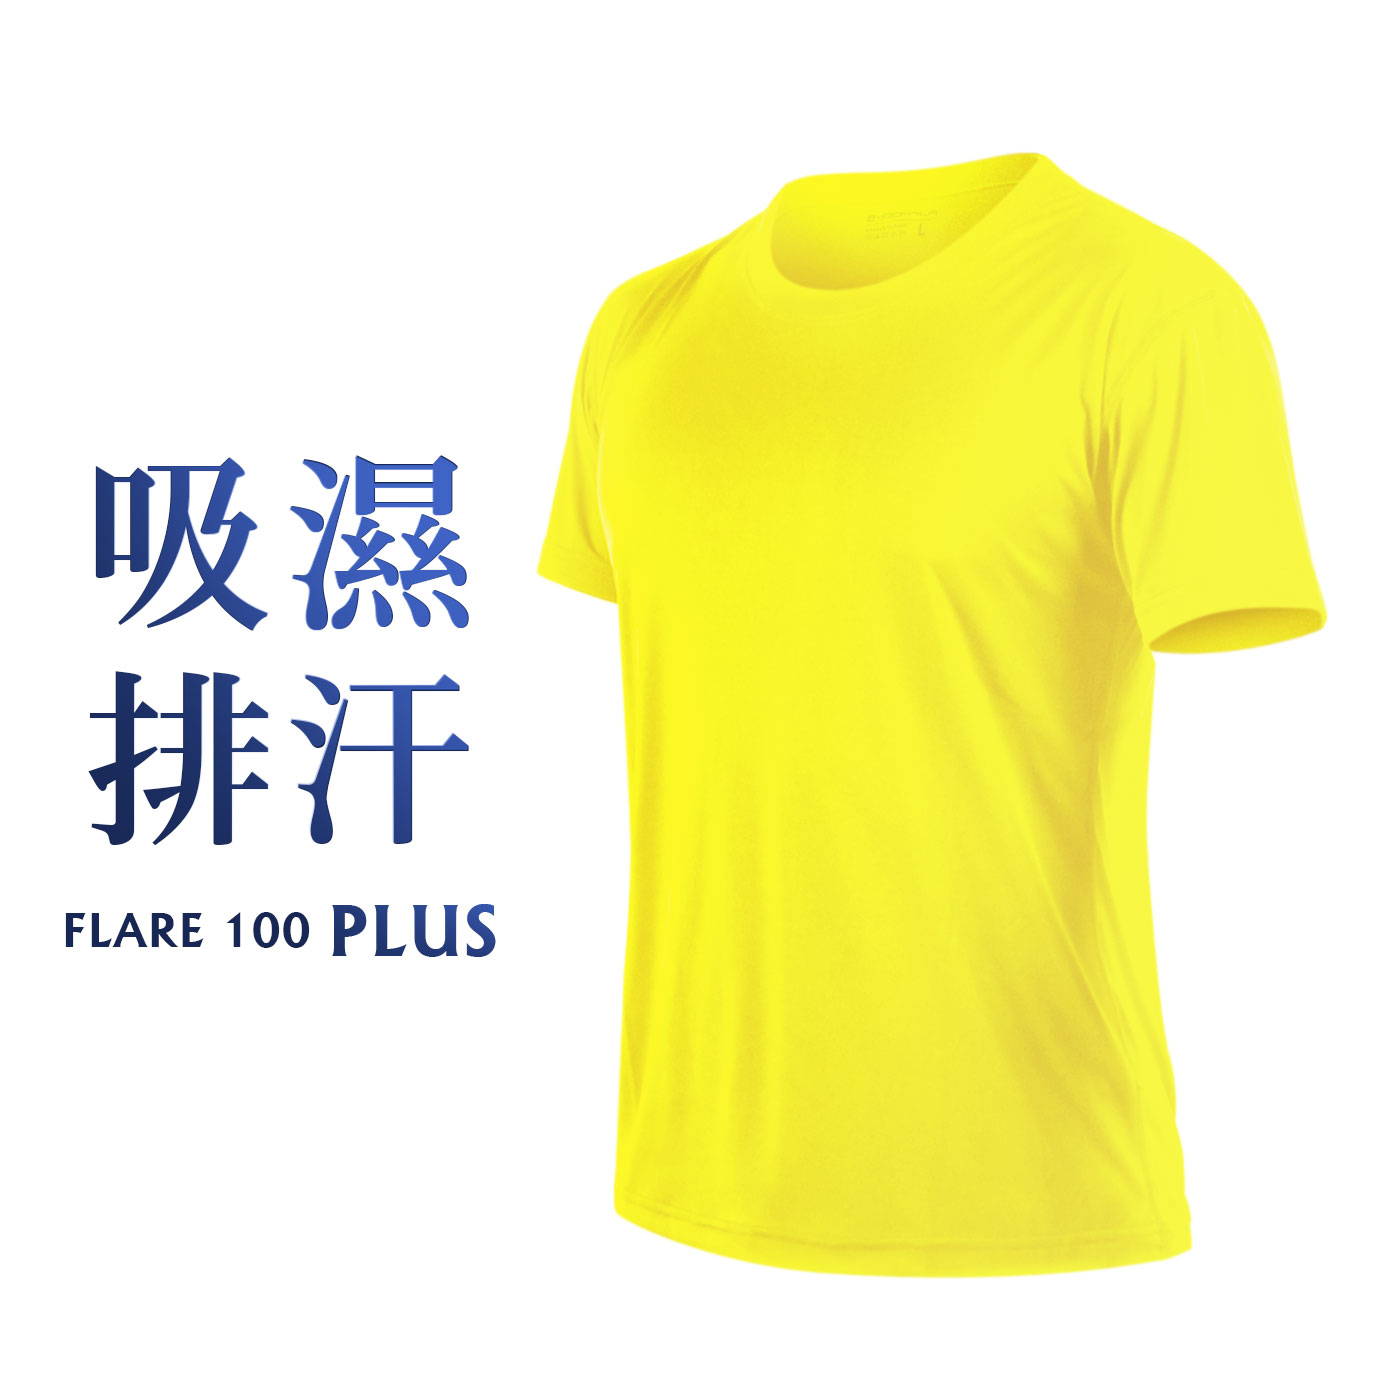 HODARLA FLARE 100 PLUS 吸濕排汗衫 3153701 - 亮黃